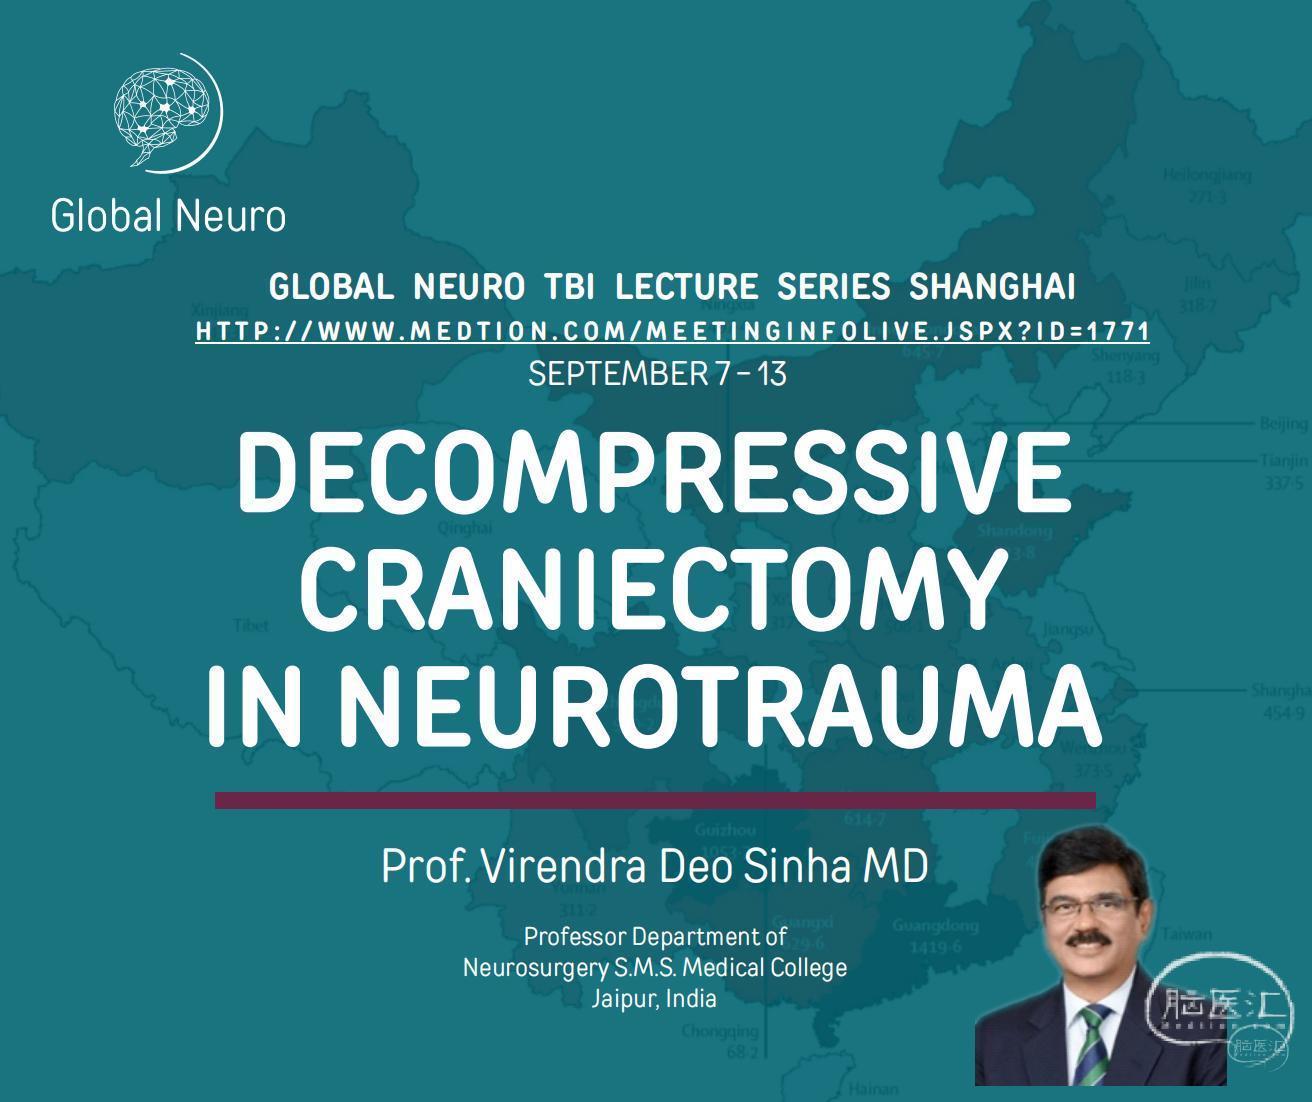 Sep 7 - Sep 13_Decompressive Craniectomy in Neurotrauma 1(1)_00.jpg